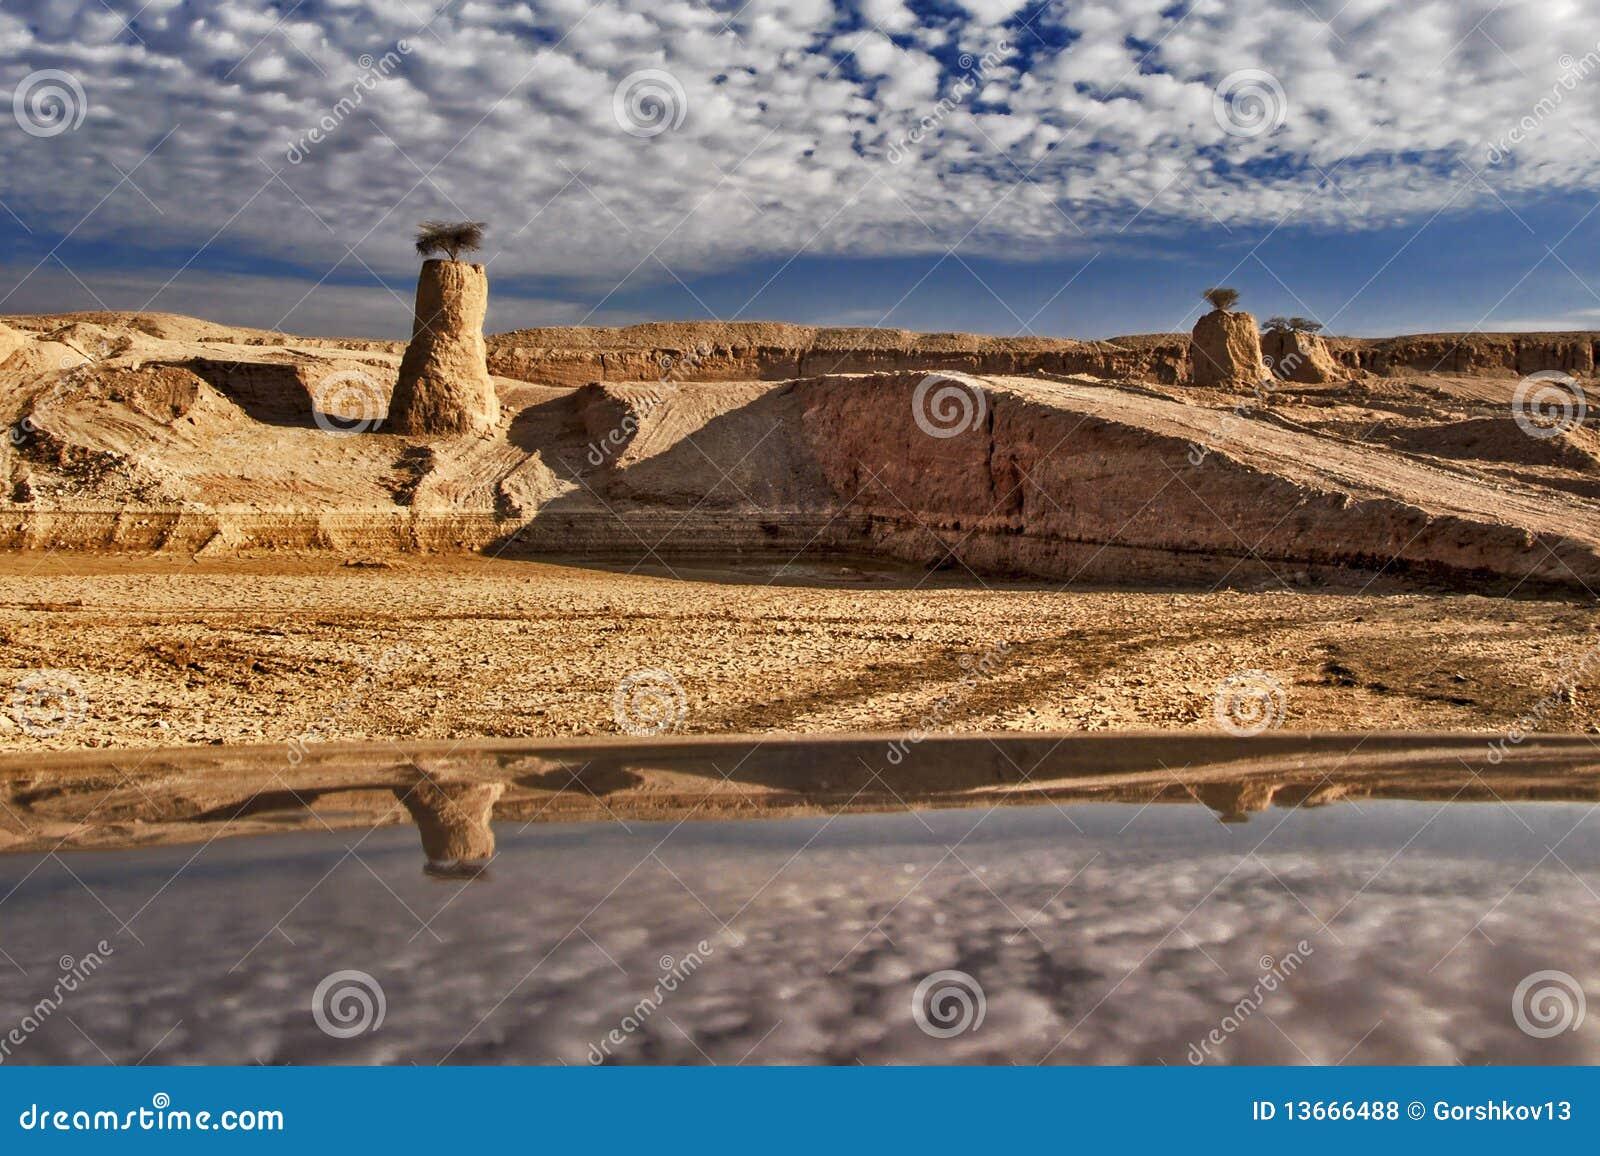 Stones of the Negev